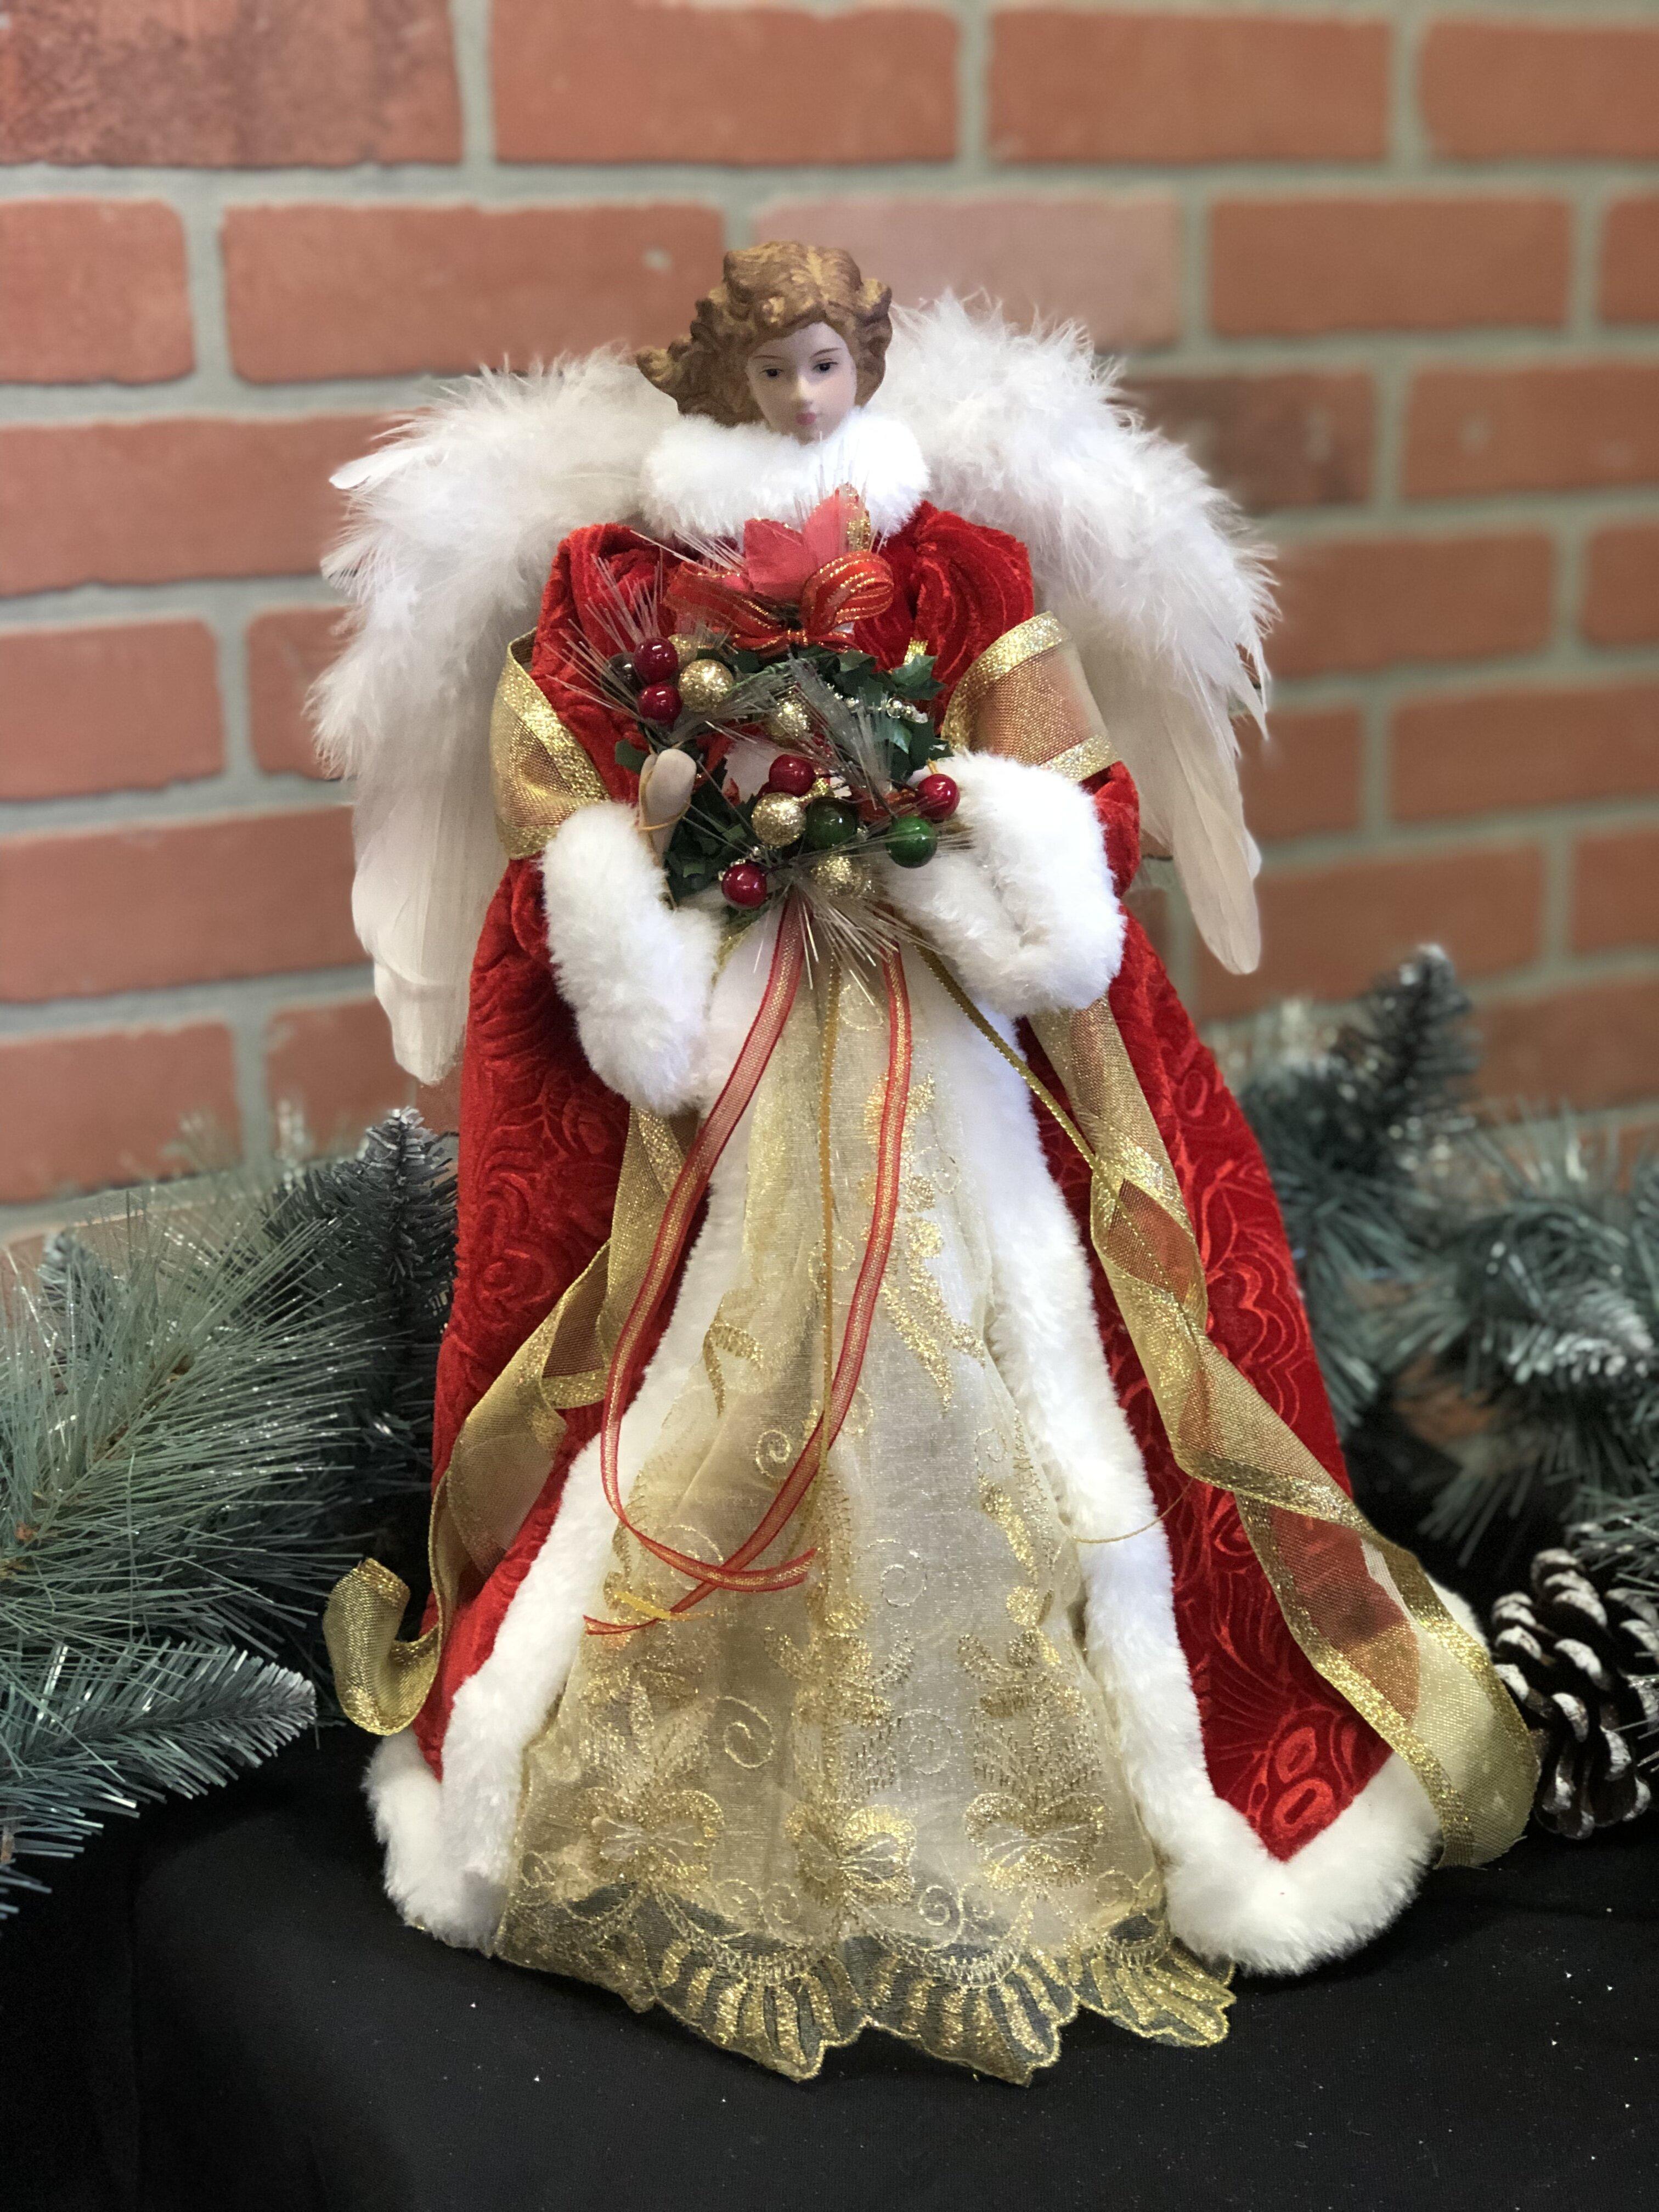 The Holiday Aisle 16 Fiber Optic Christmas Angel Tree Topper Reviews Wayfair